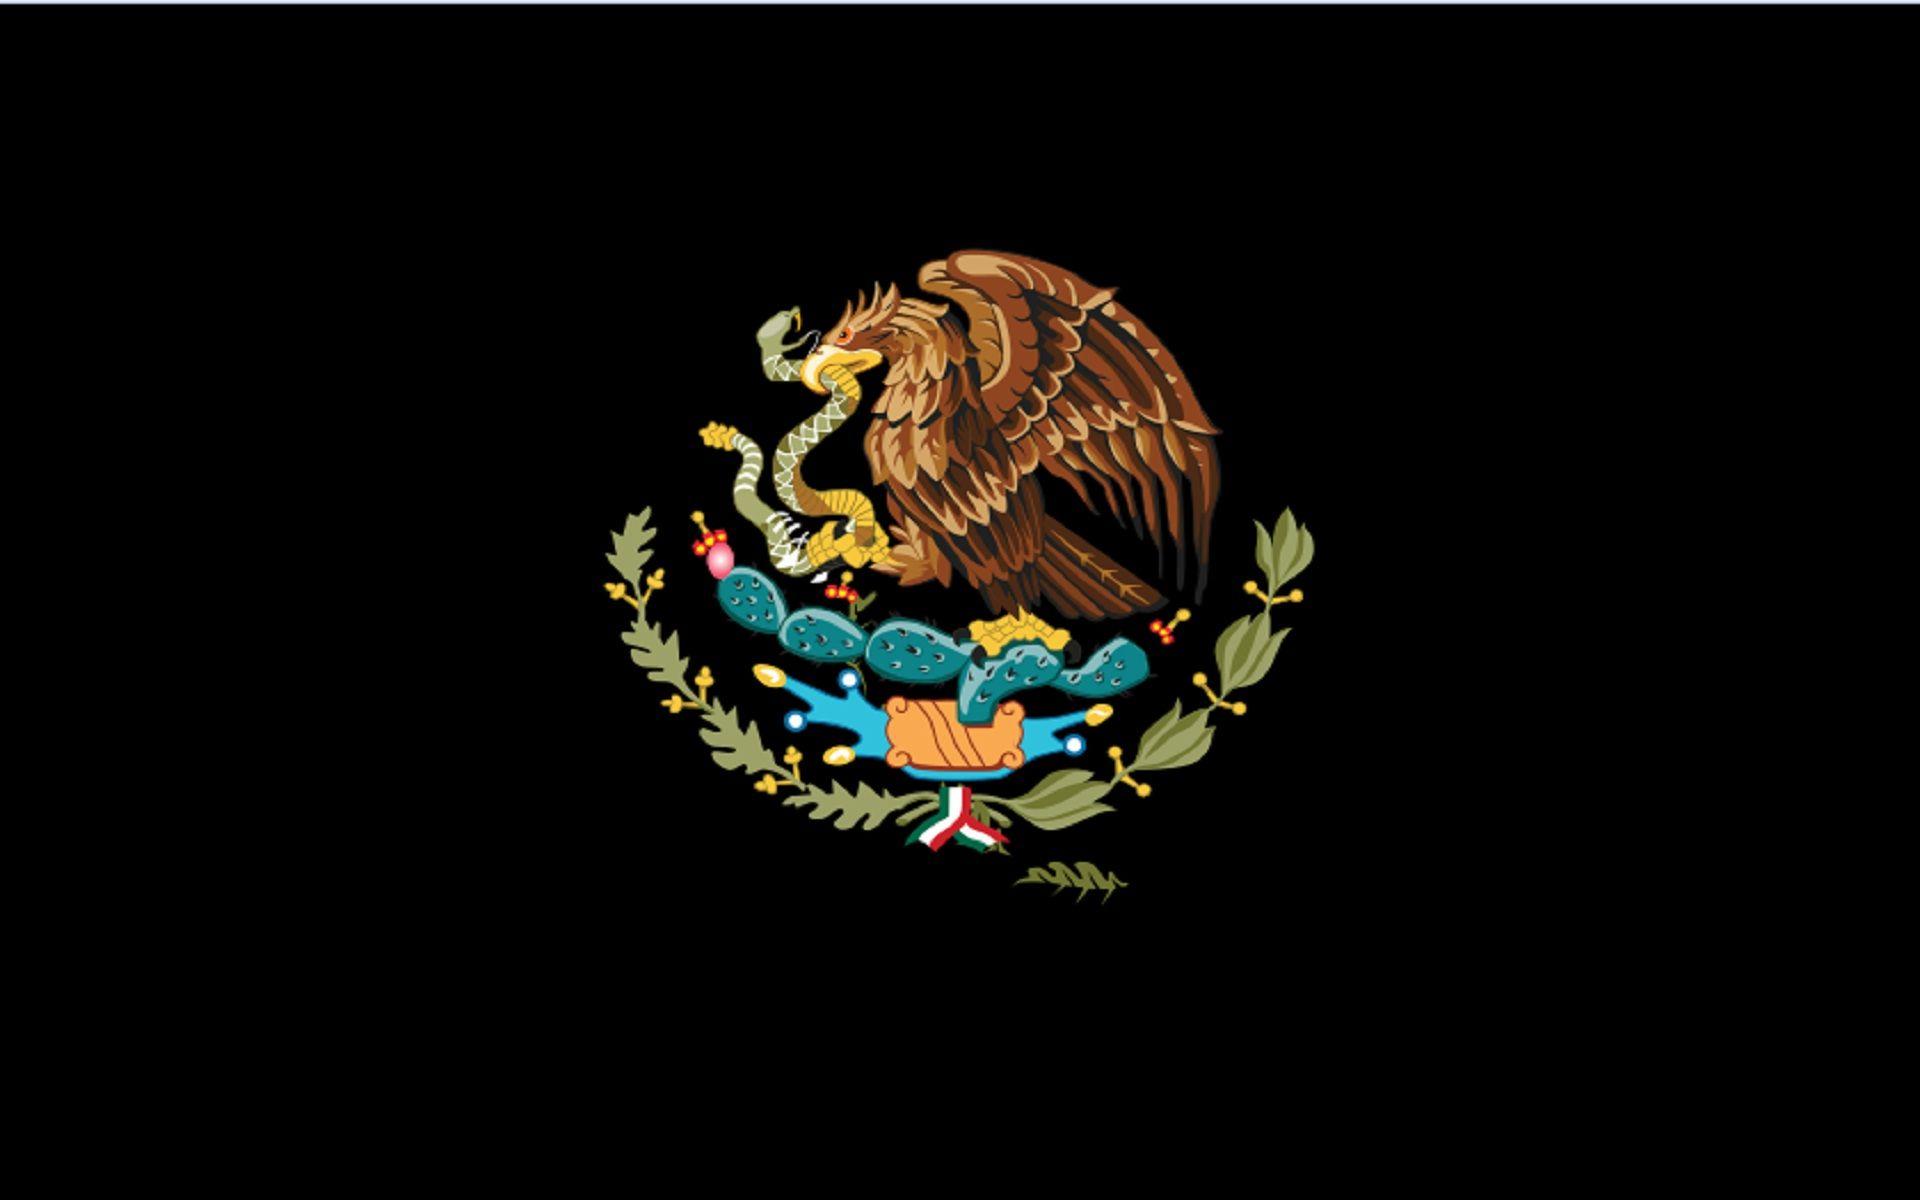 Mexican Flag Eagle Wallpaper